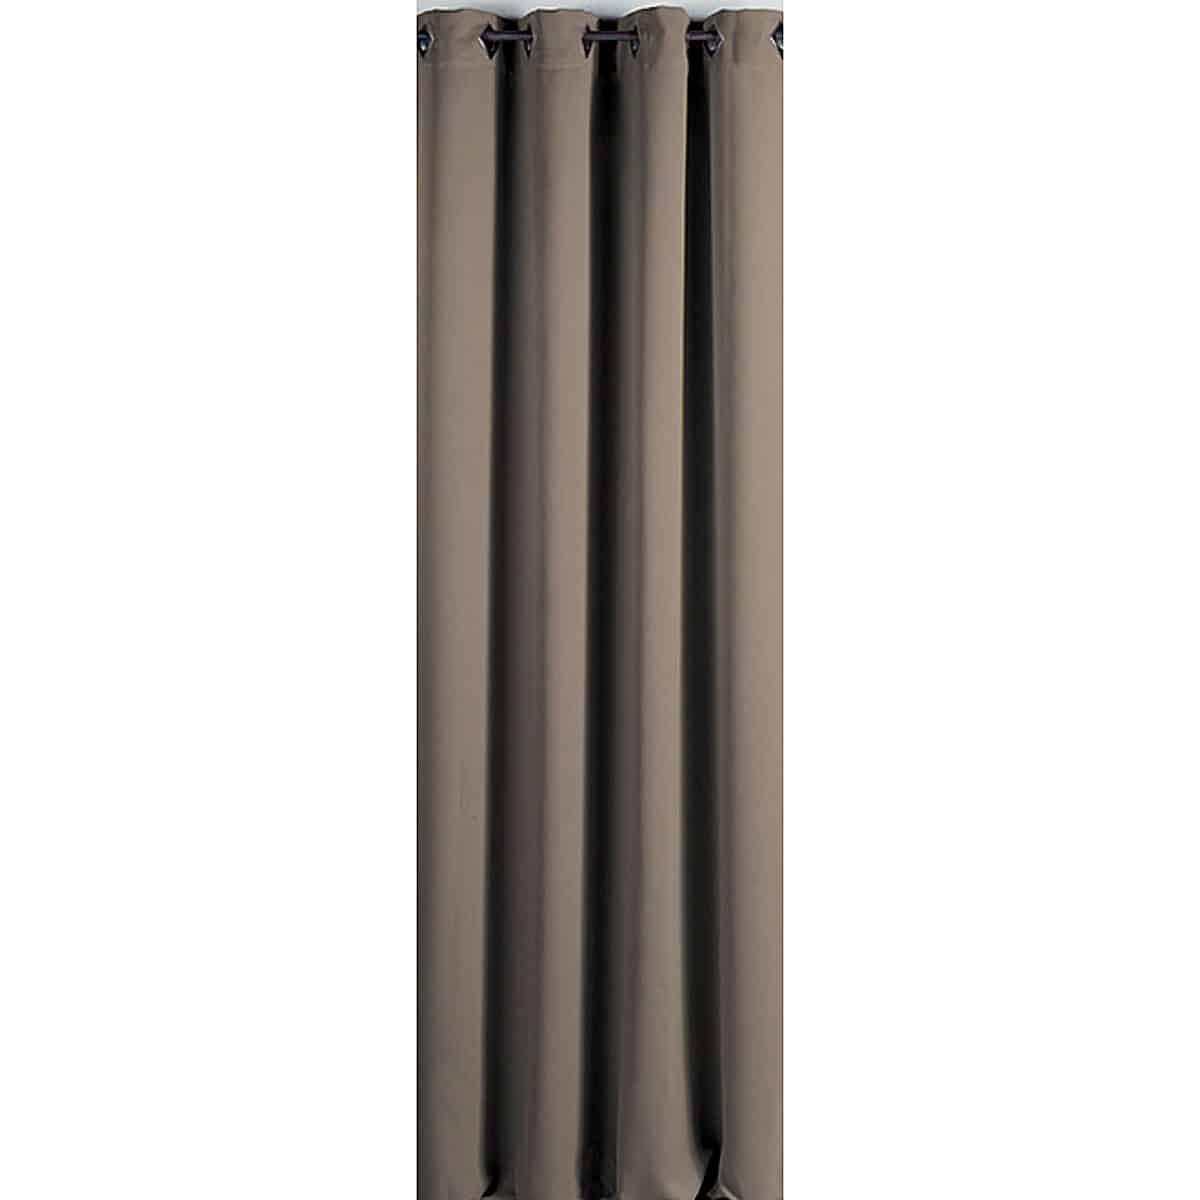 Blackout Window Curtain Panel Square Grommets Cocoon Solid Color 55 W x 102''L 55 W X 102''L Dark Beige